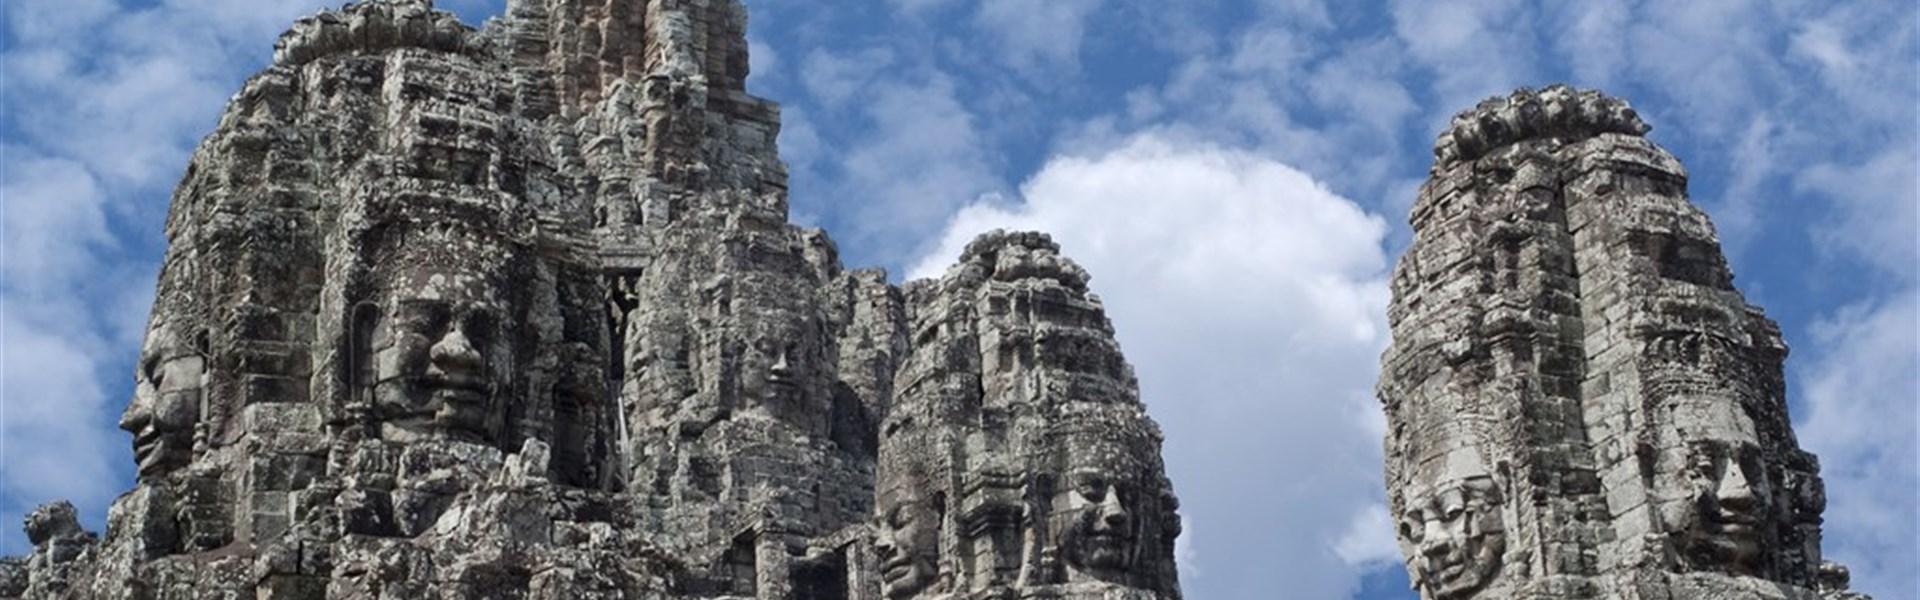 Prodloužení zájezdu do Thajska o Angkor (3 noci) -